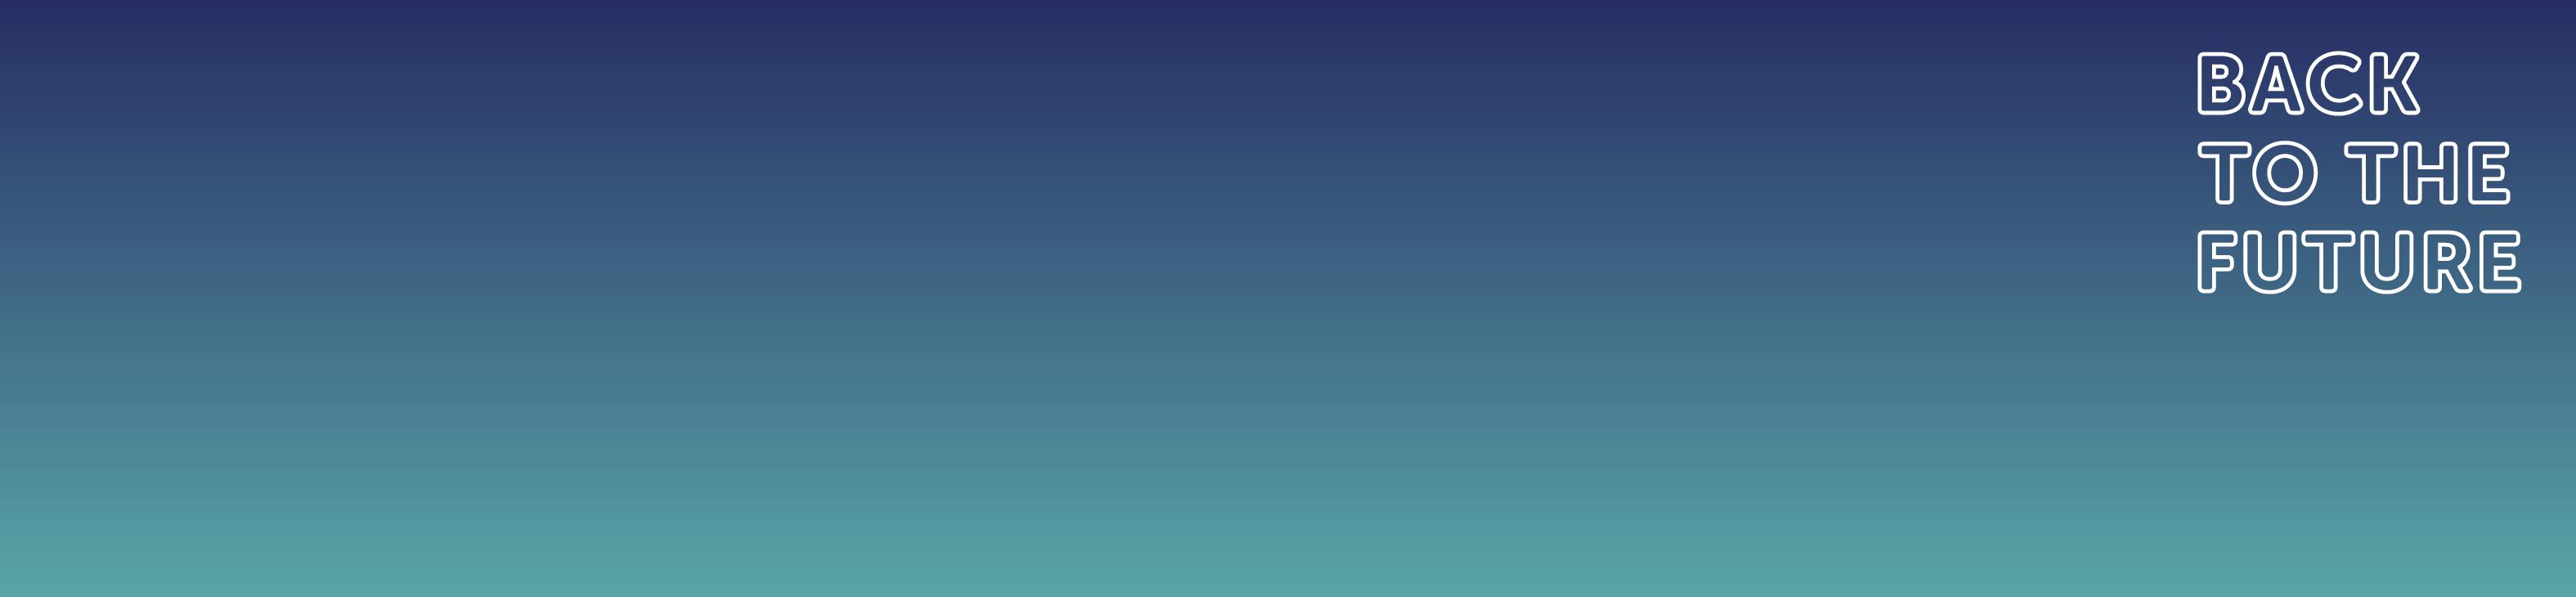 BTF_banner-04